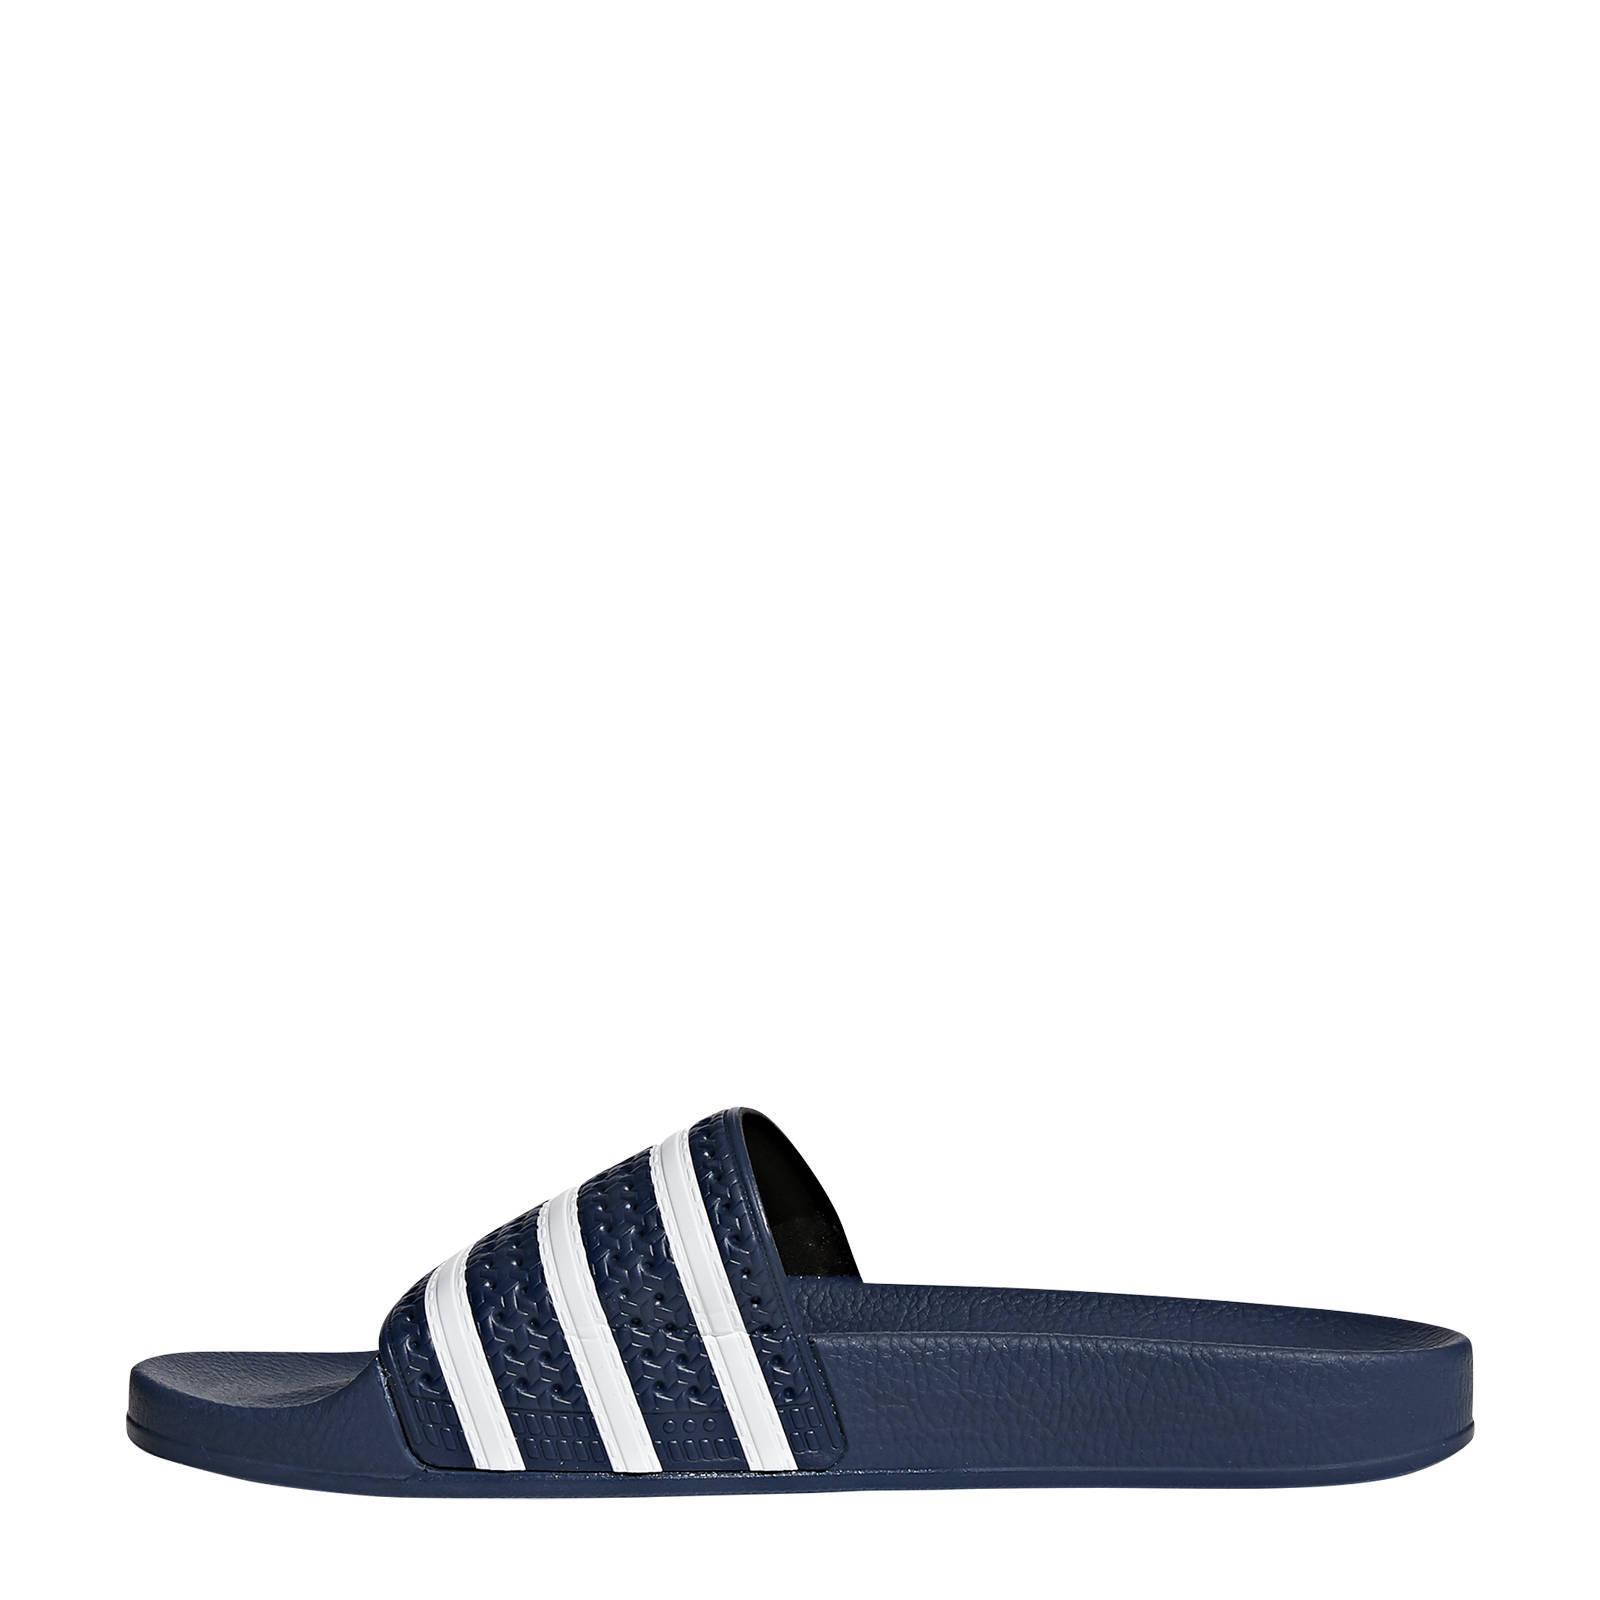 2d4ca3ec686 adidas originals Adilette badslippers donkerblauw | wehkamp